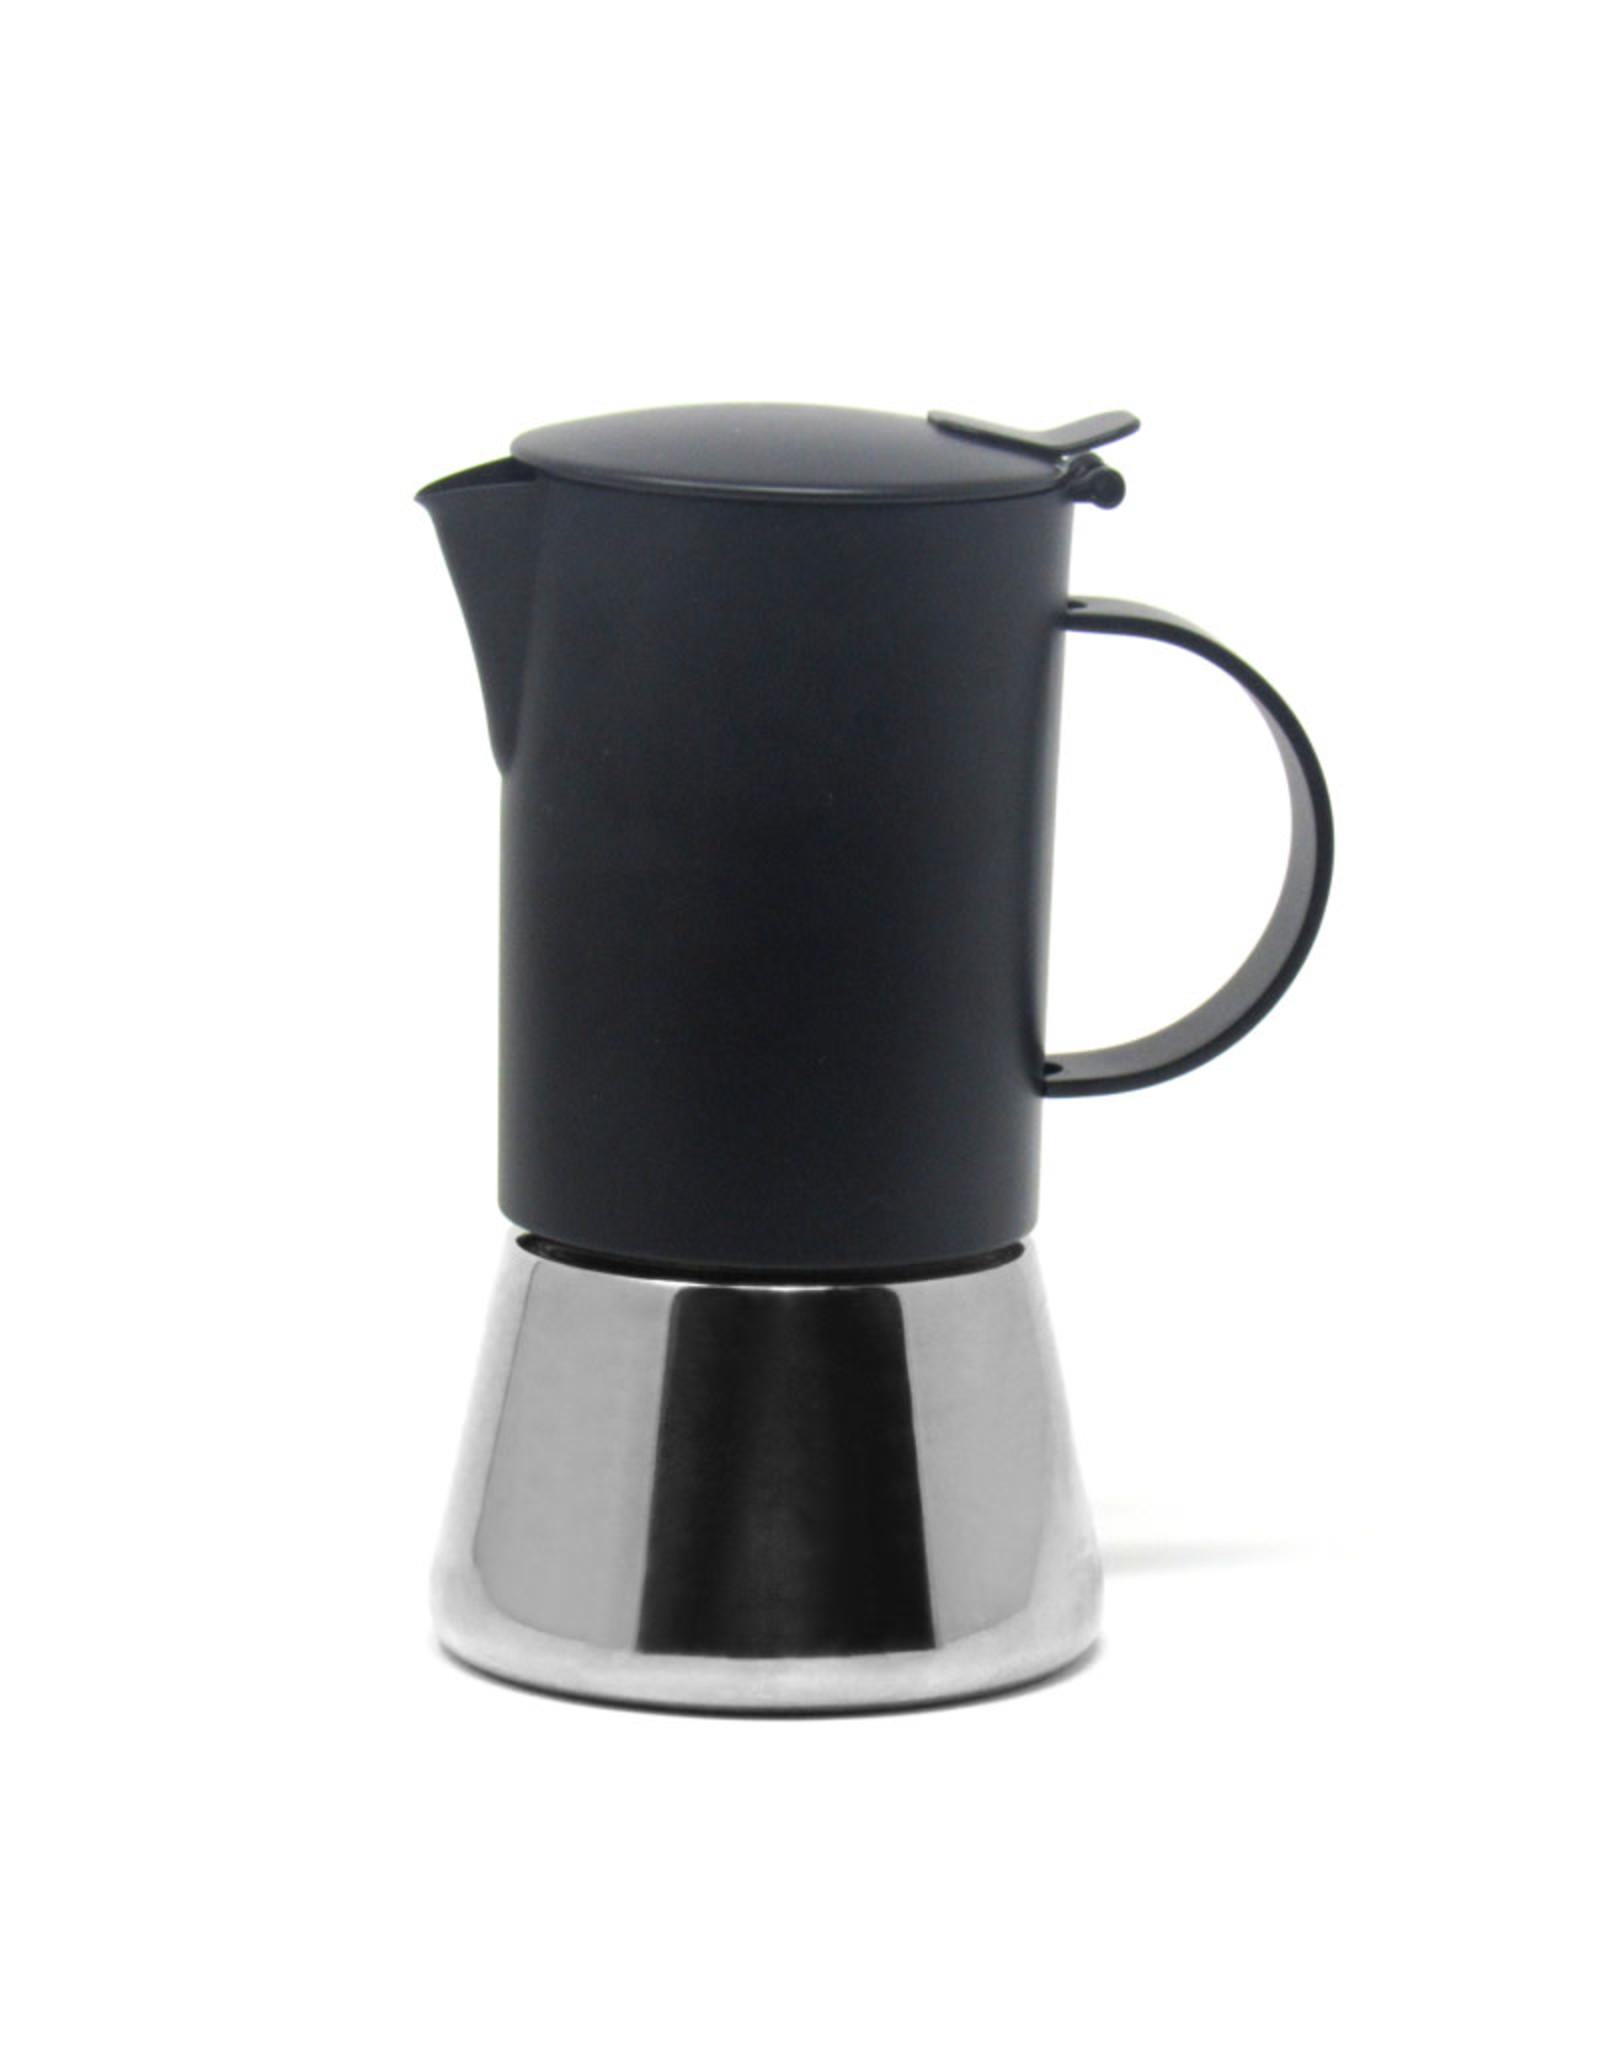 Danesco Cafe Culture - Stove Top Espresso Maker